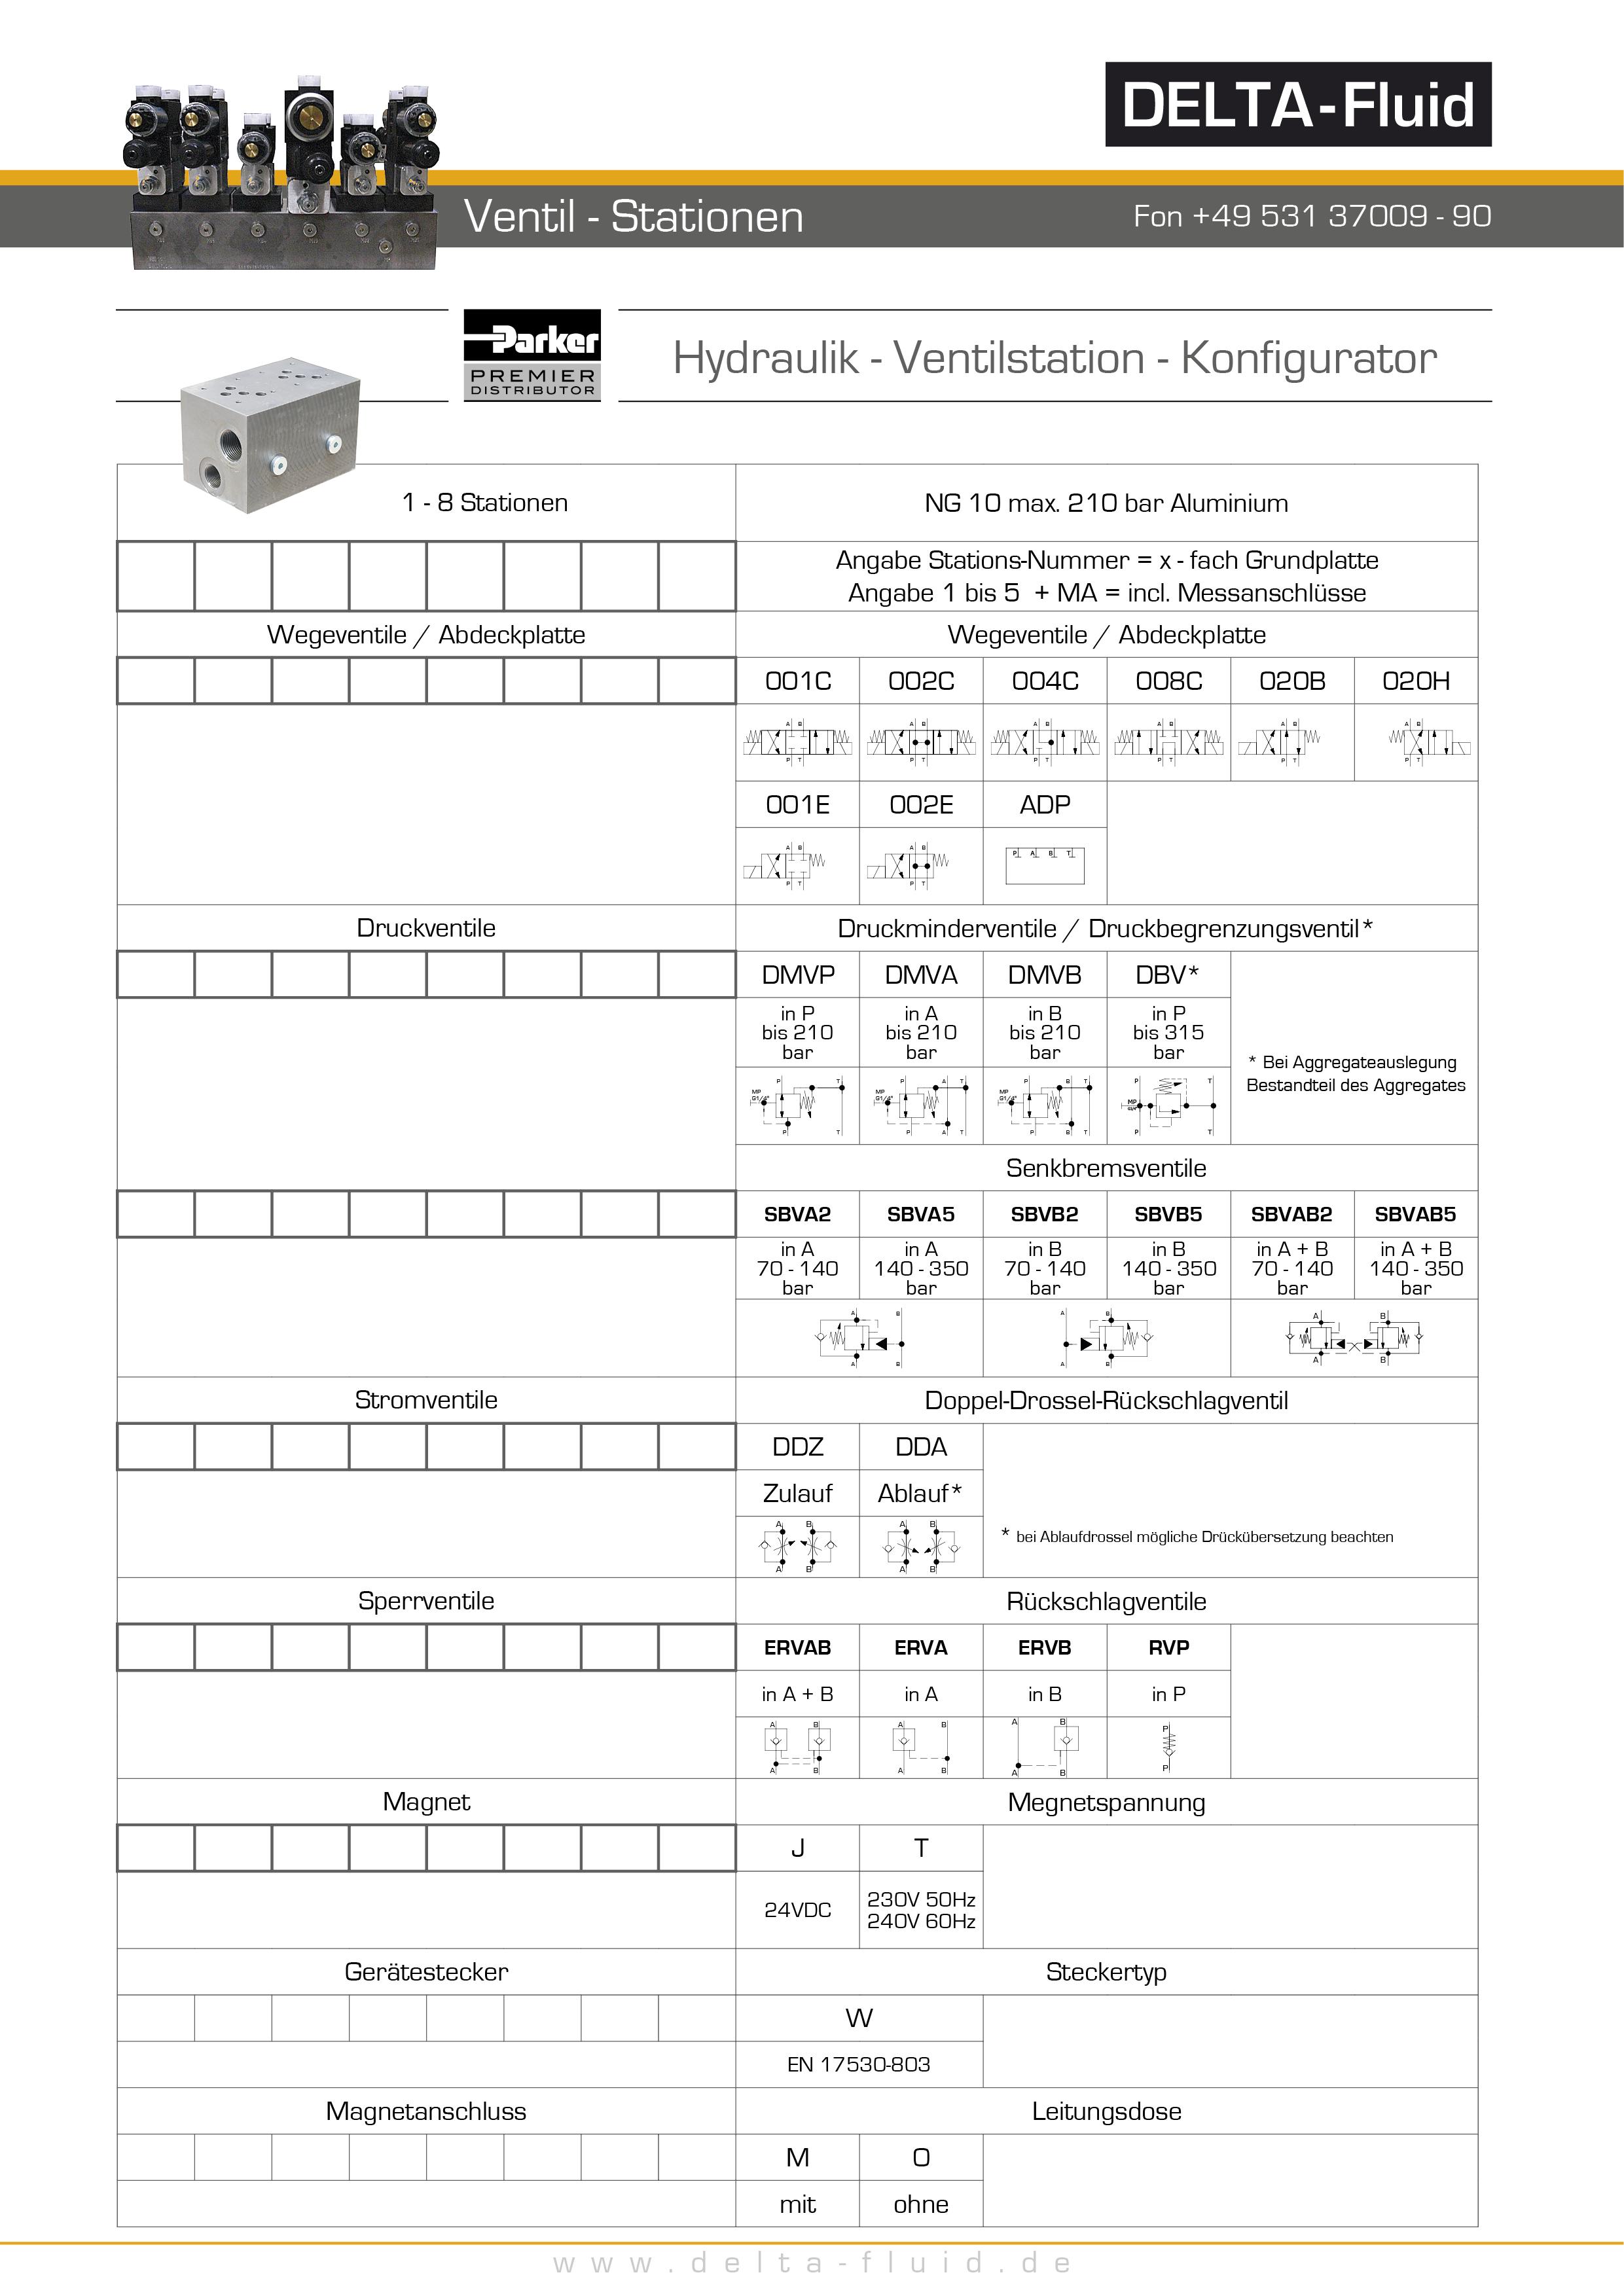 Ventilstation-Konfiguration-NG10-Alu58e49c0db5269